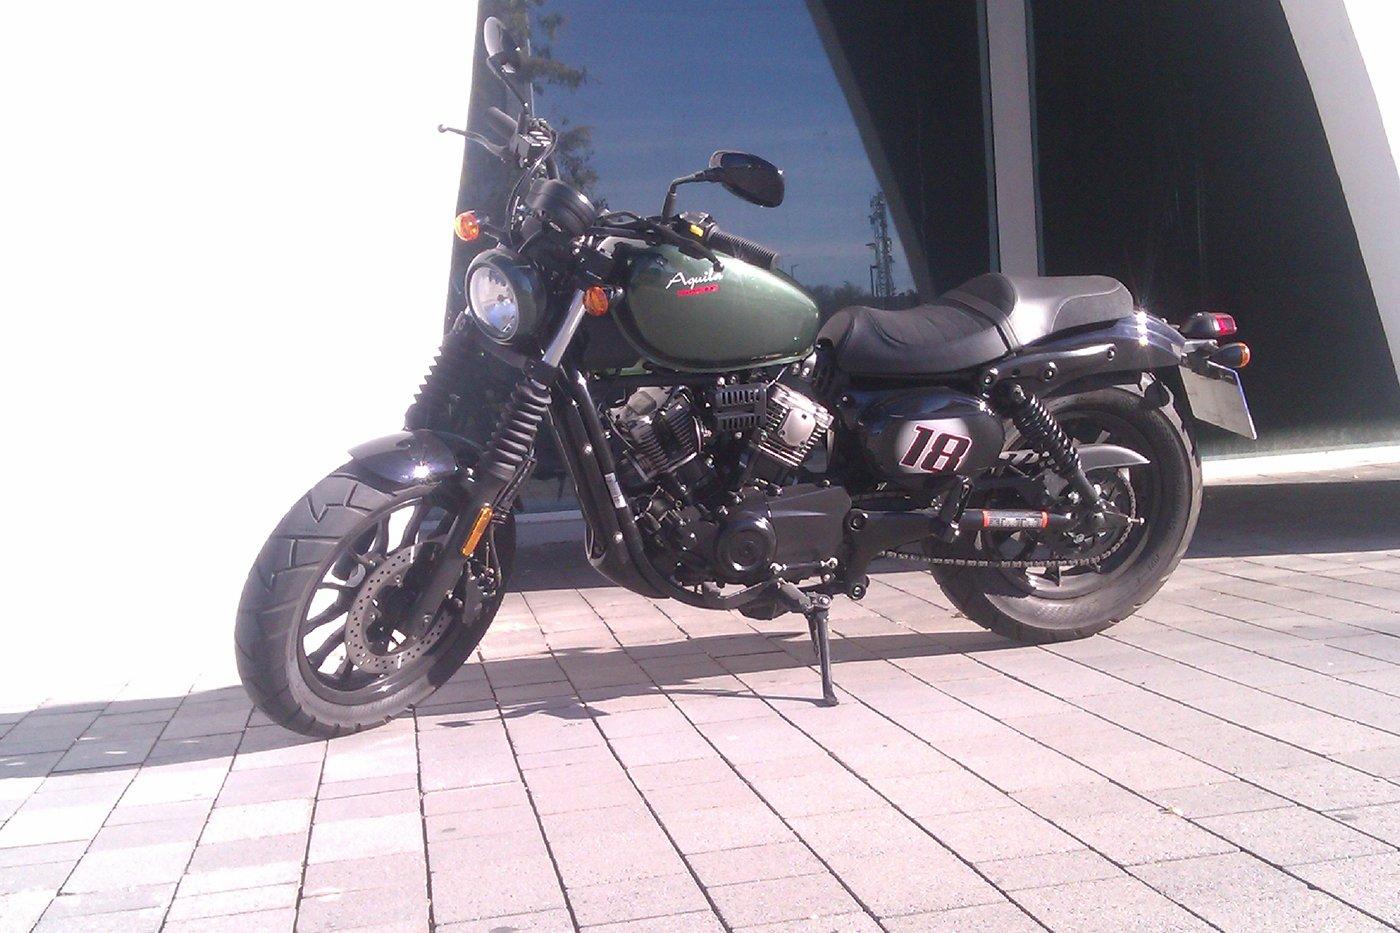 Aquila GV 125 S